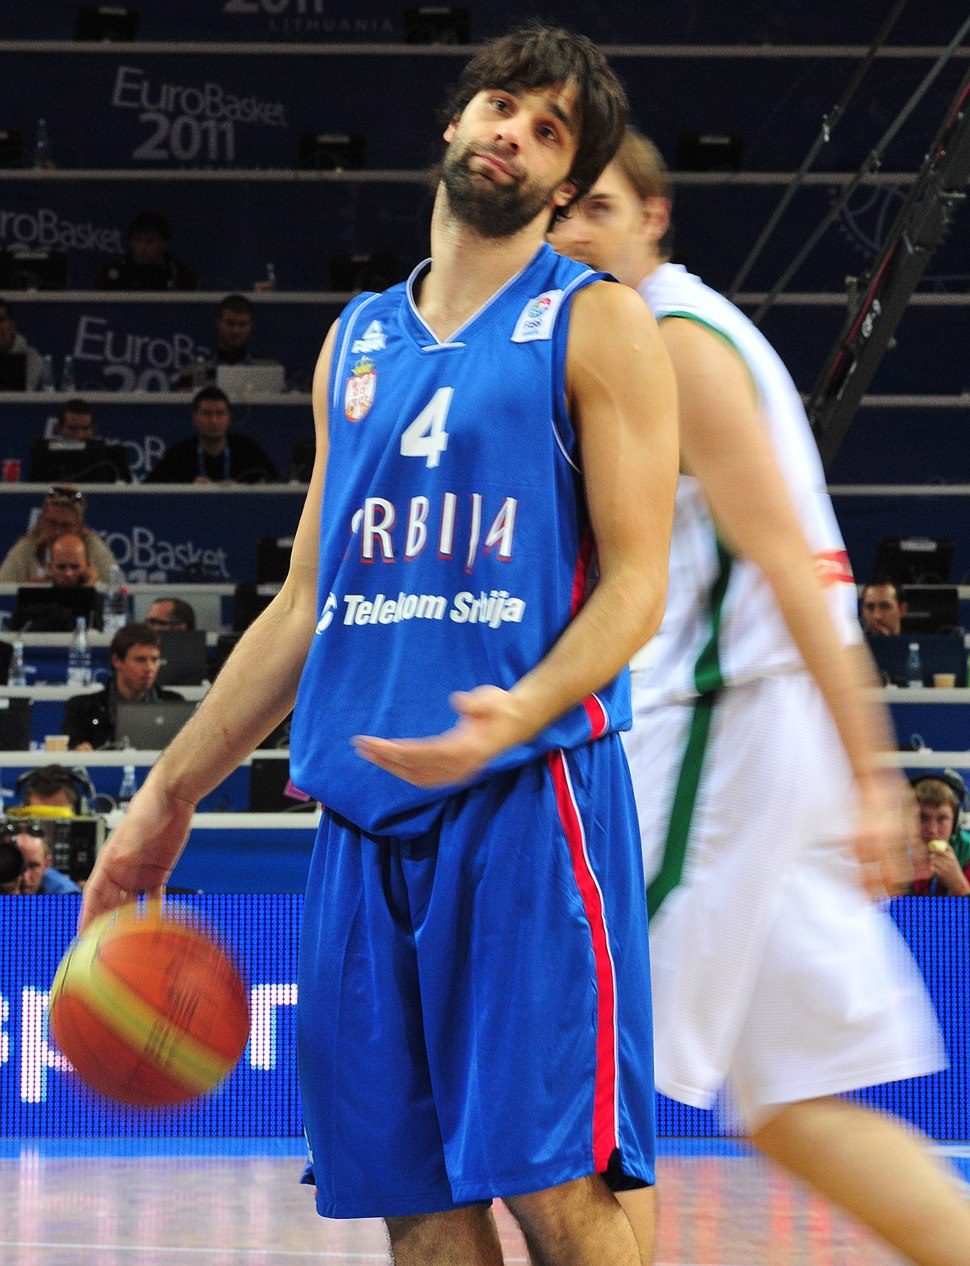 Milos Teodosic Eurobasket 2011